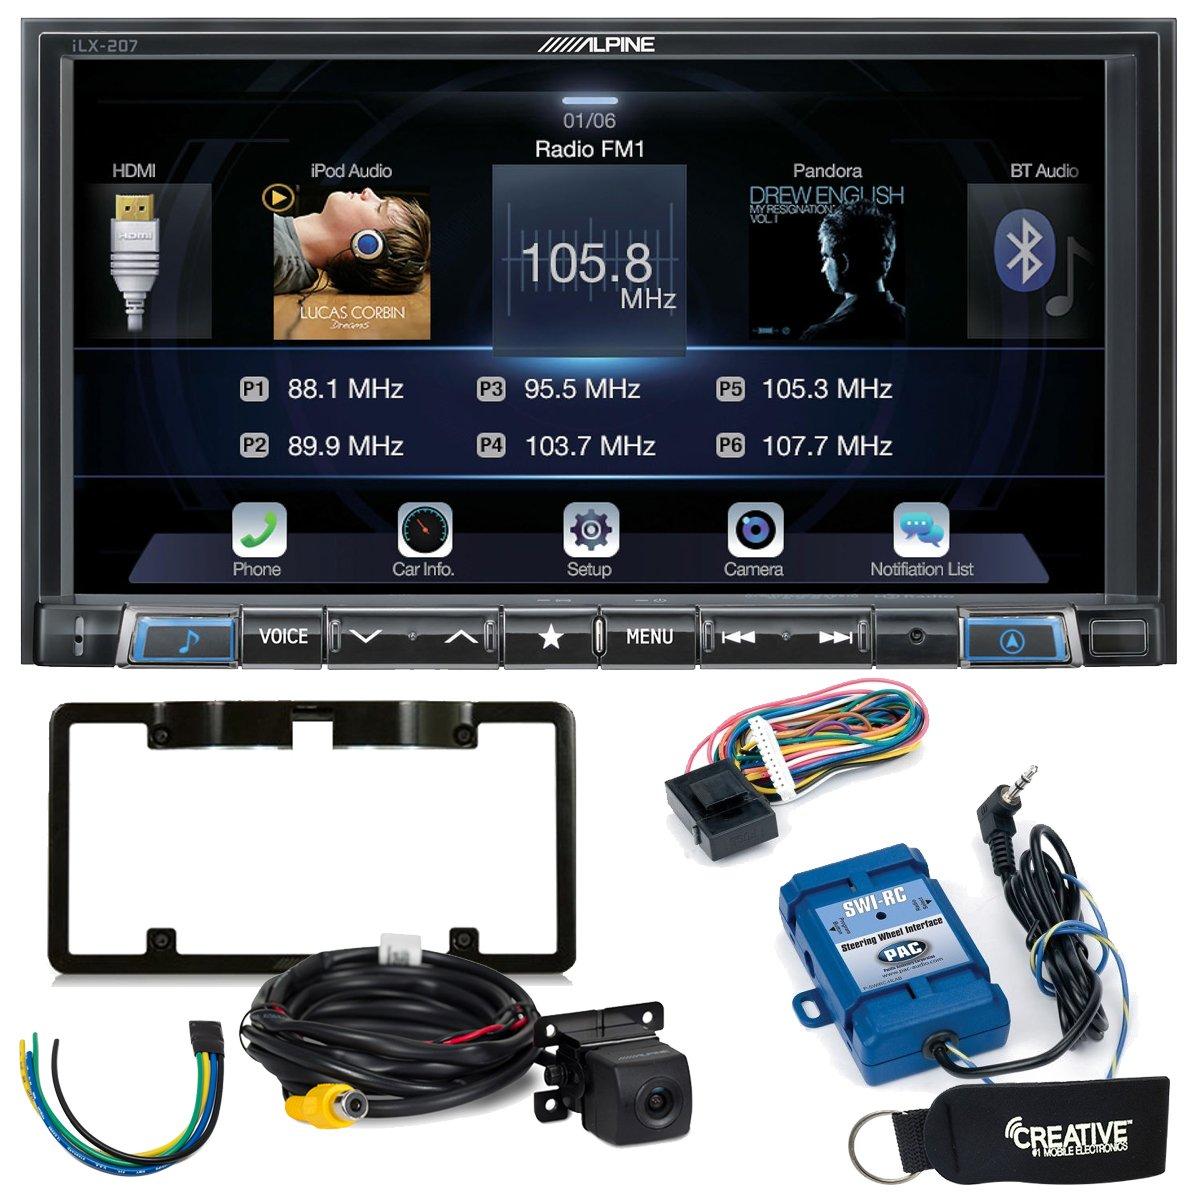 Alpine ilx-207 Apple CarPlay & Android自動受信機W/Alpine背面カメラ、ステアリングホイールインターフェイス、トリガーMod B07887GTX8